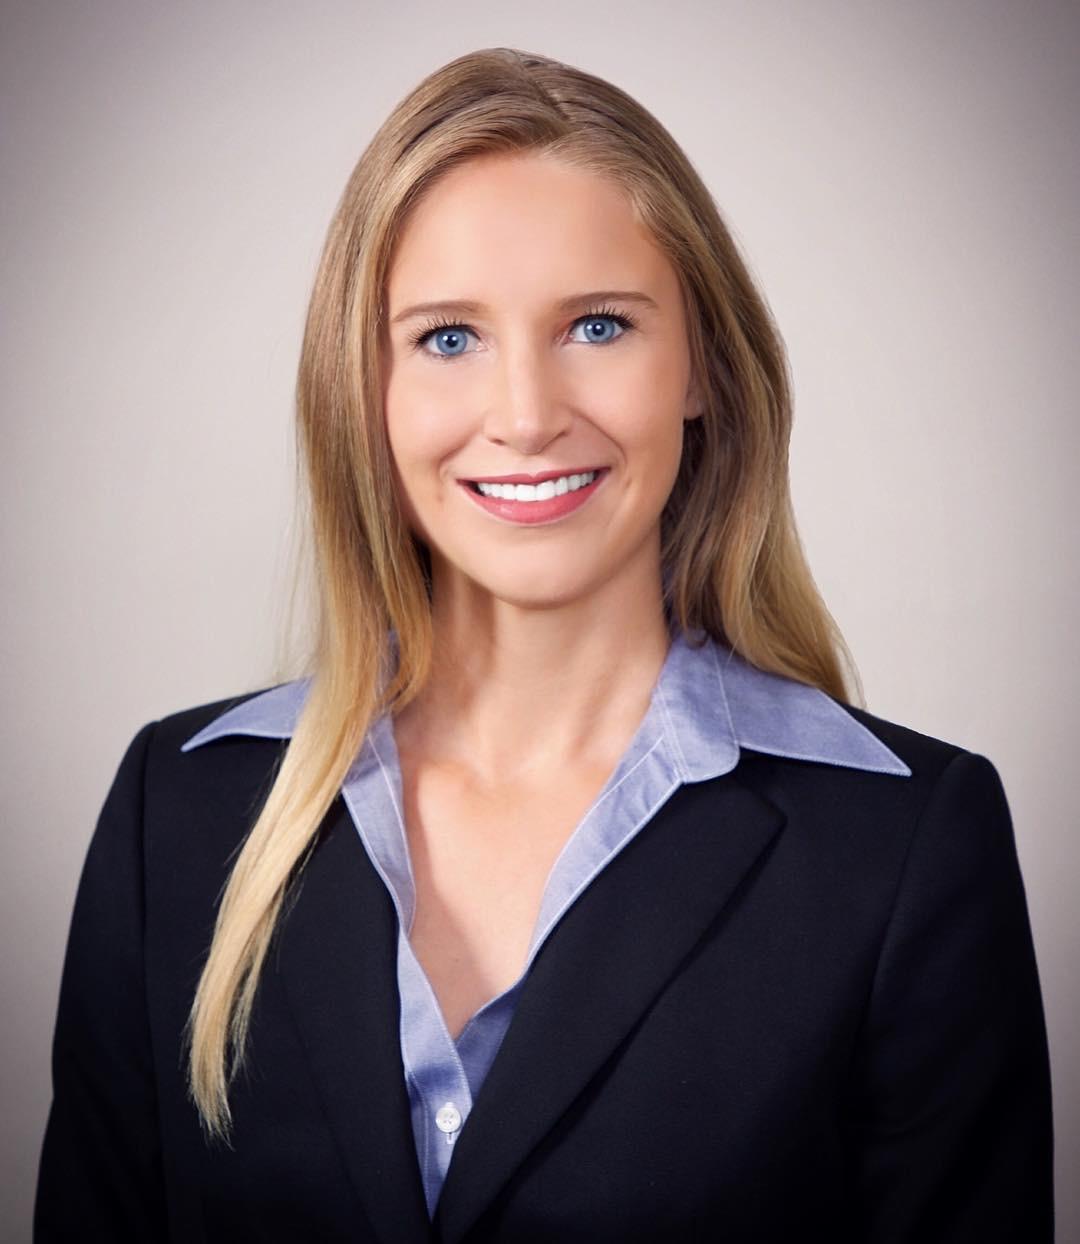 Grace Kilpatrick | La Jolla, CA | Morgan Stanley Wealth Management